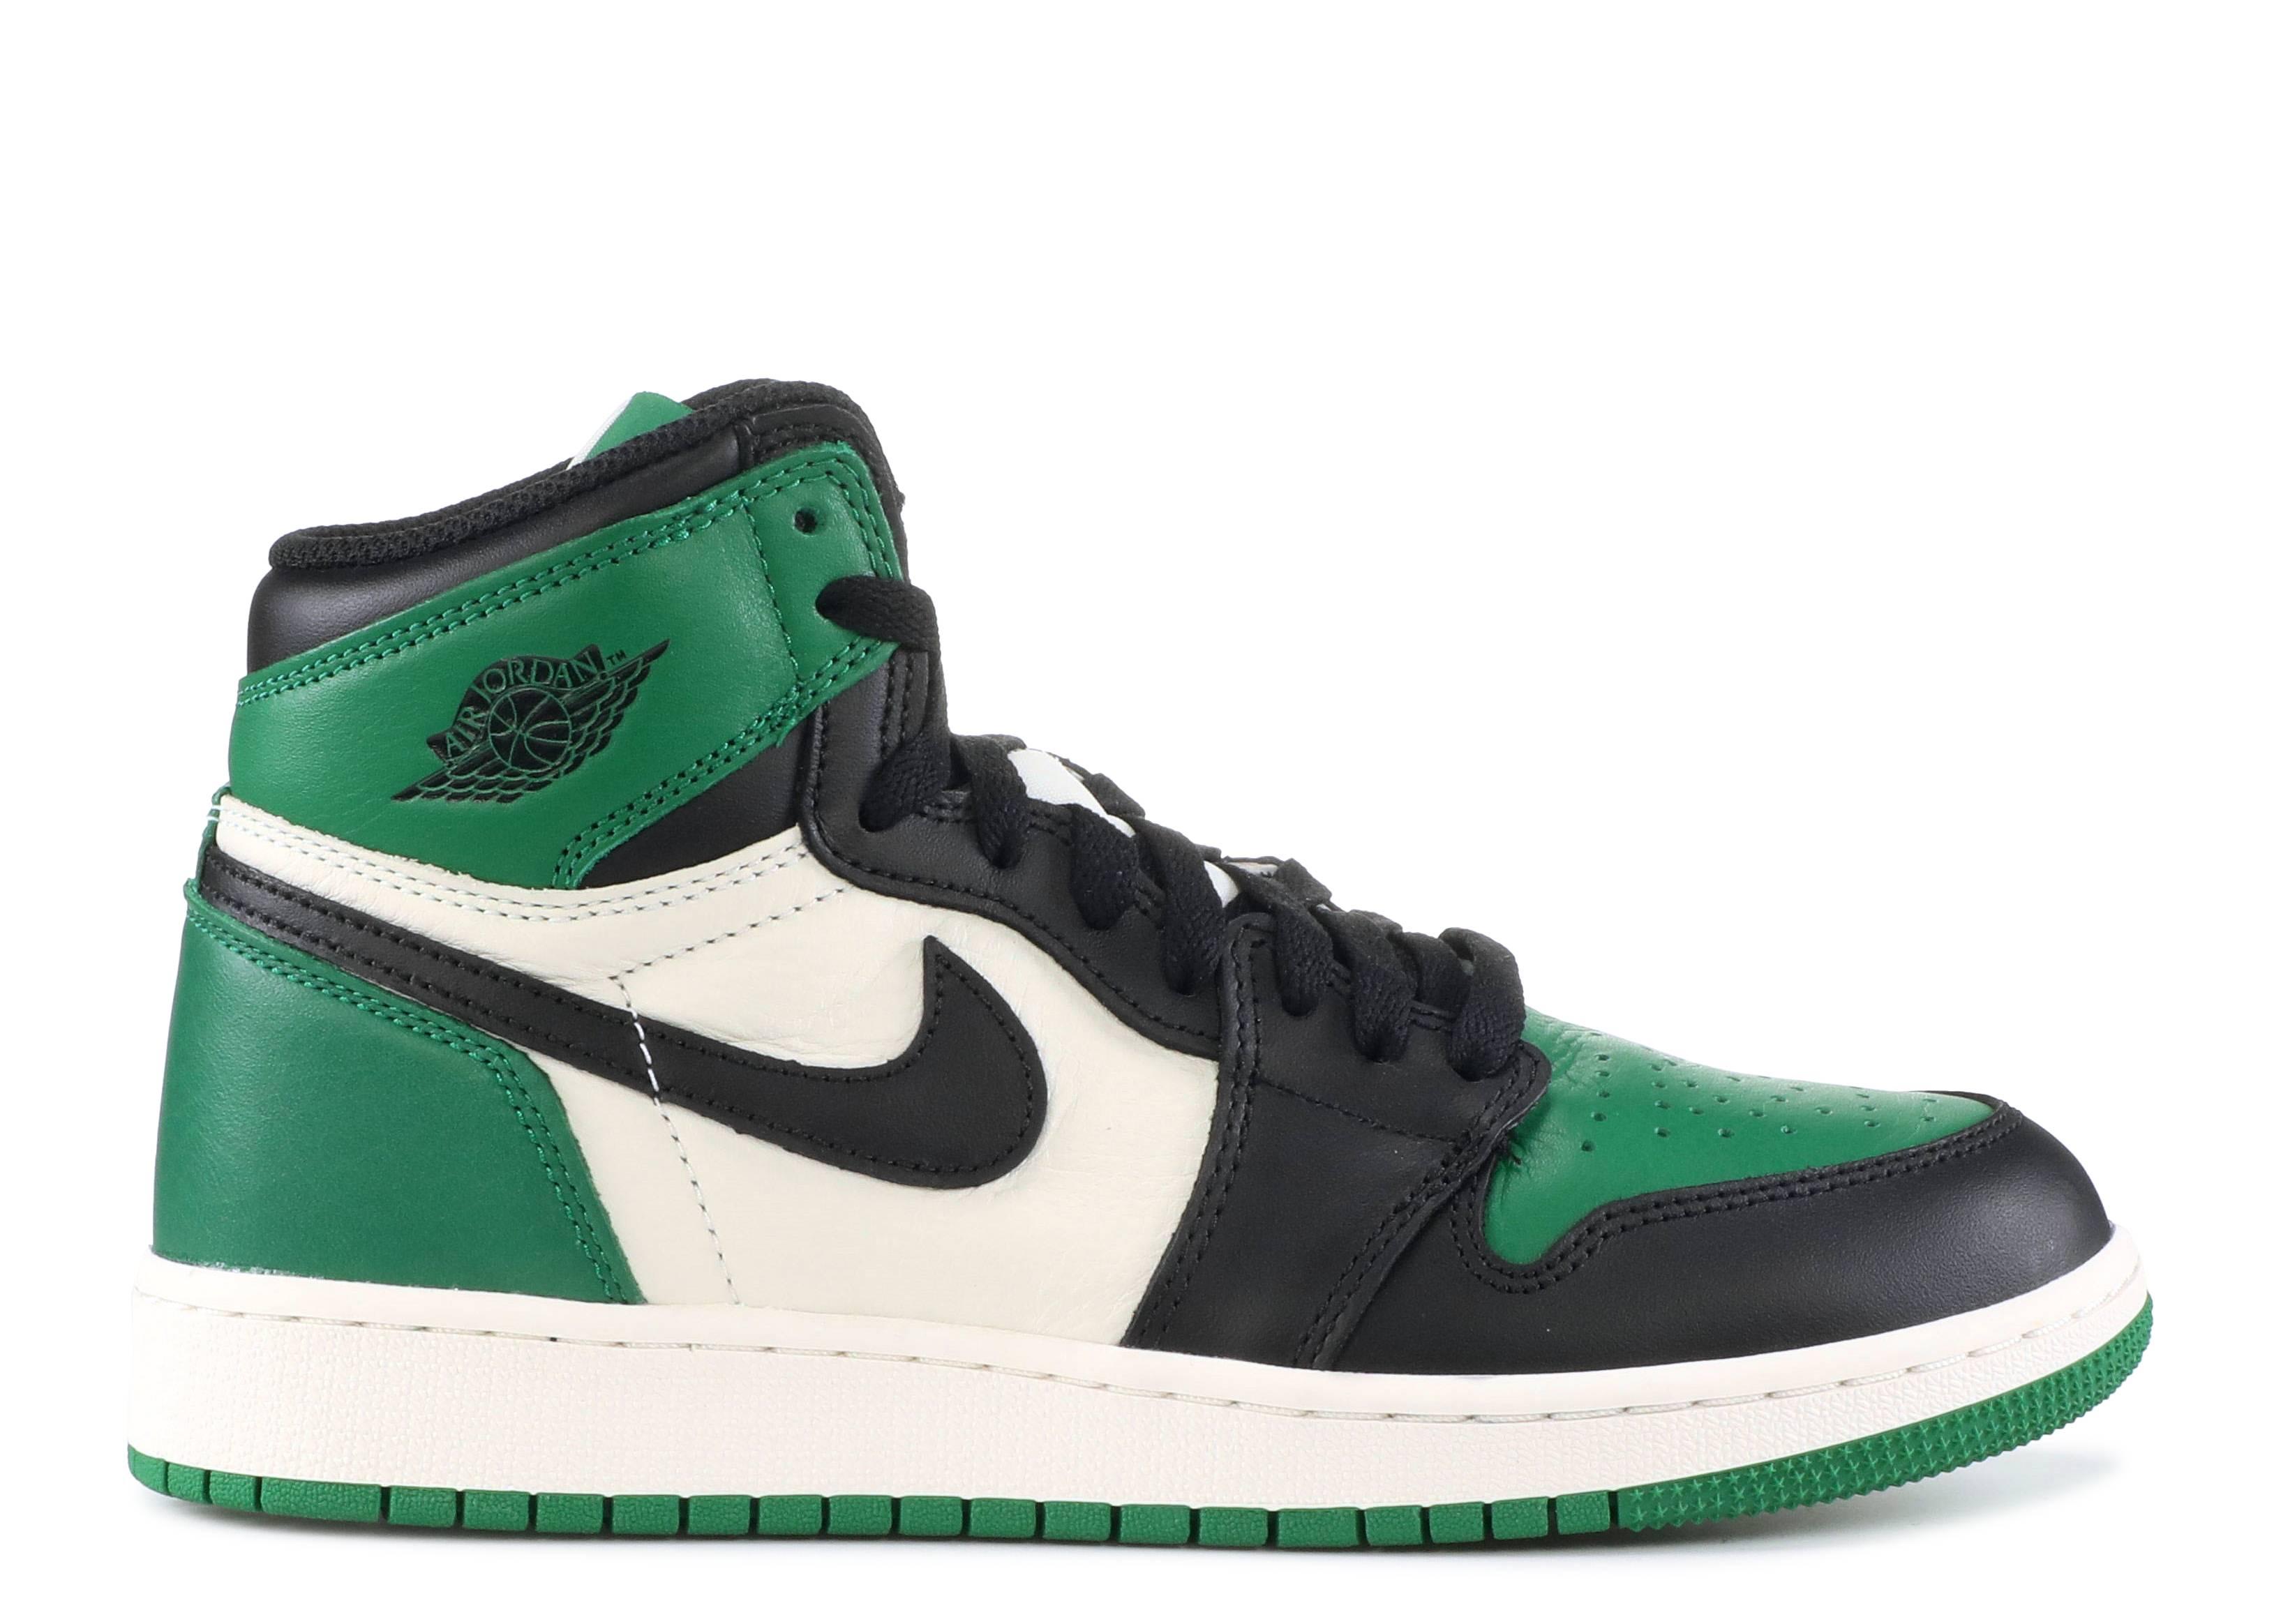 56390501dea0 Air Jordan 1 Retro High Og (gs)